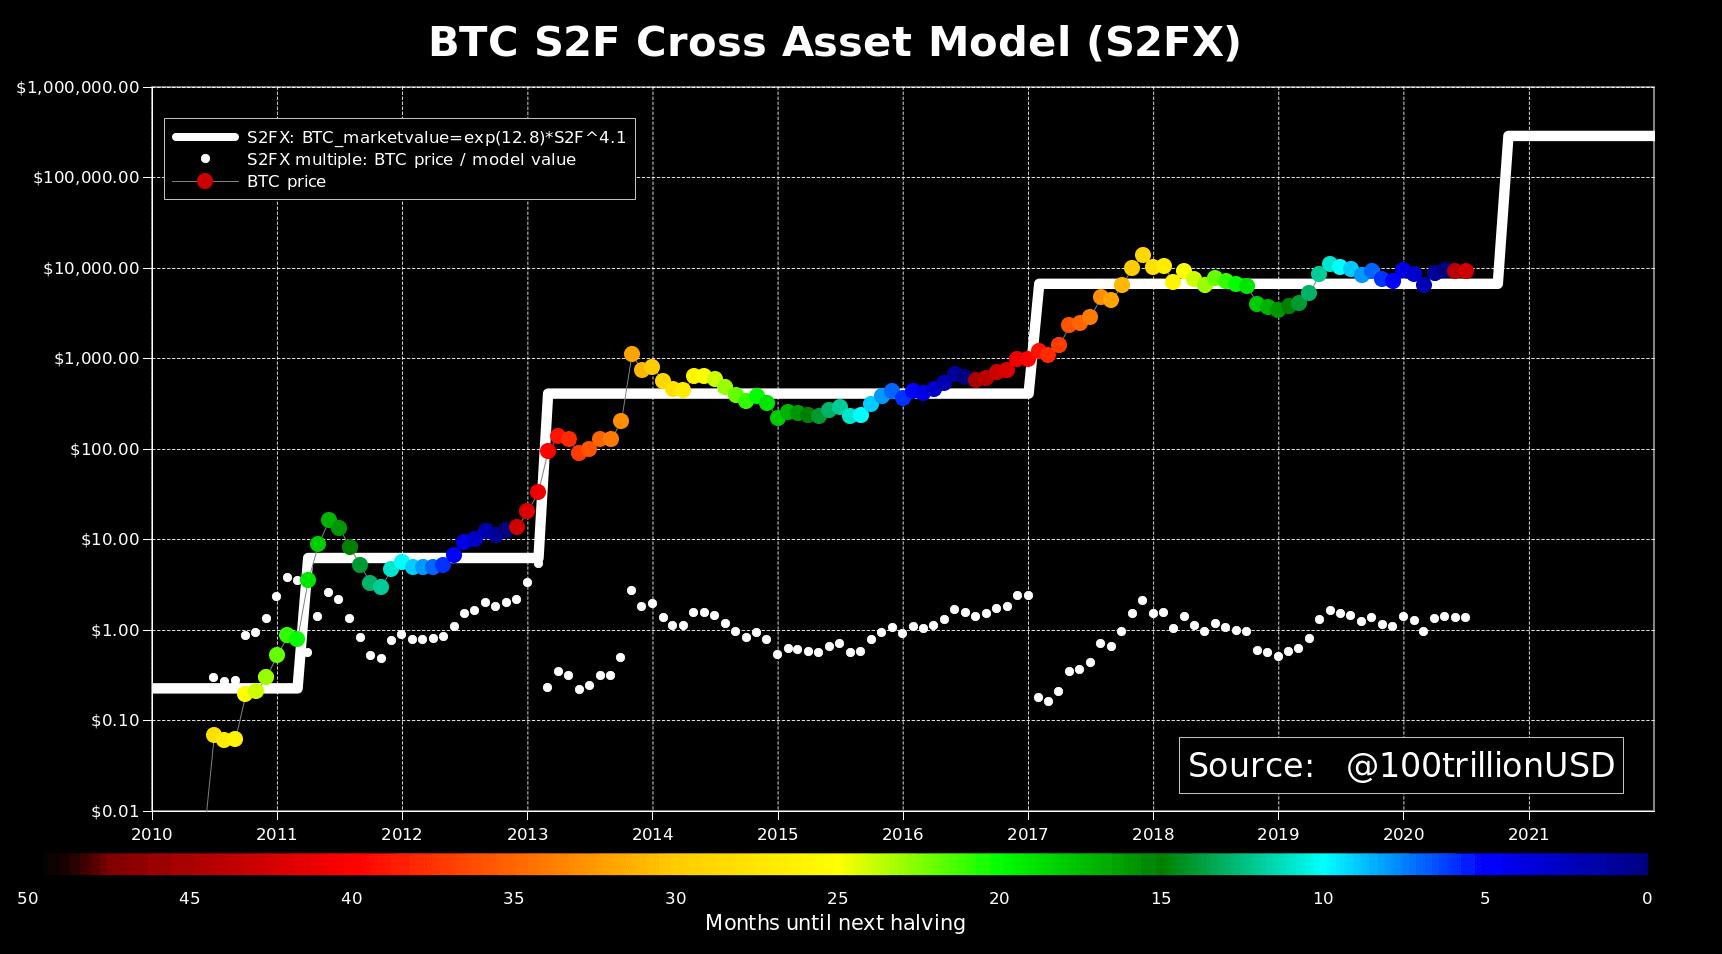 Bitcoin S2FX Model